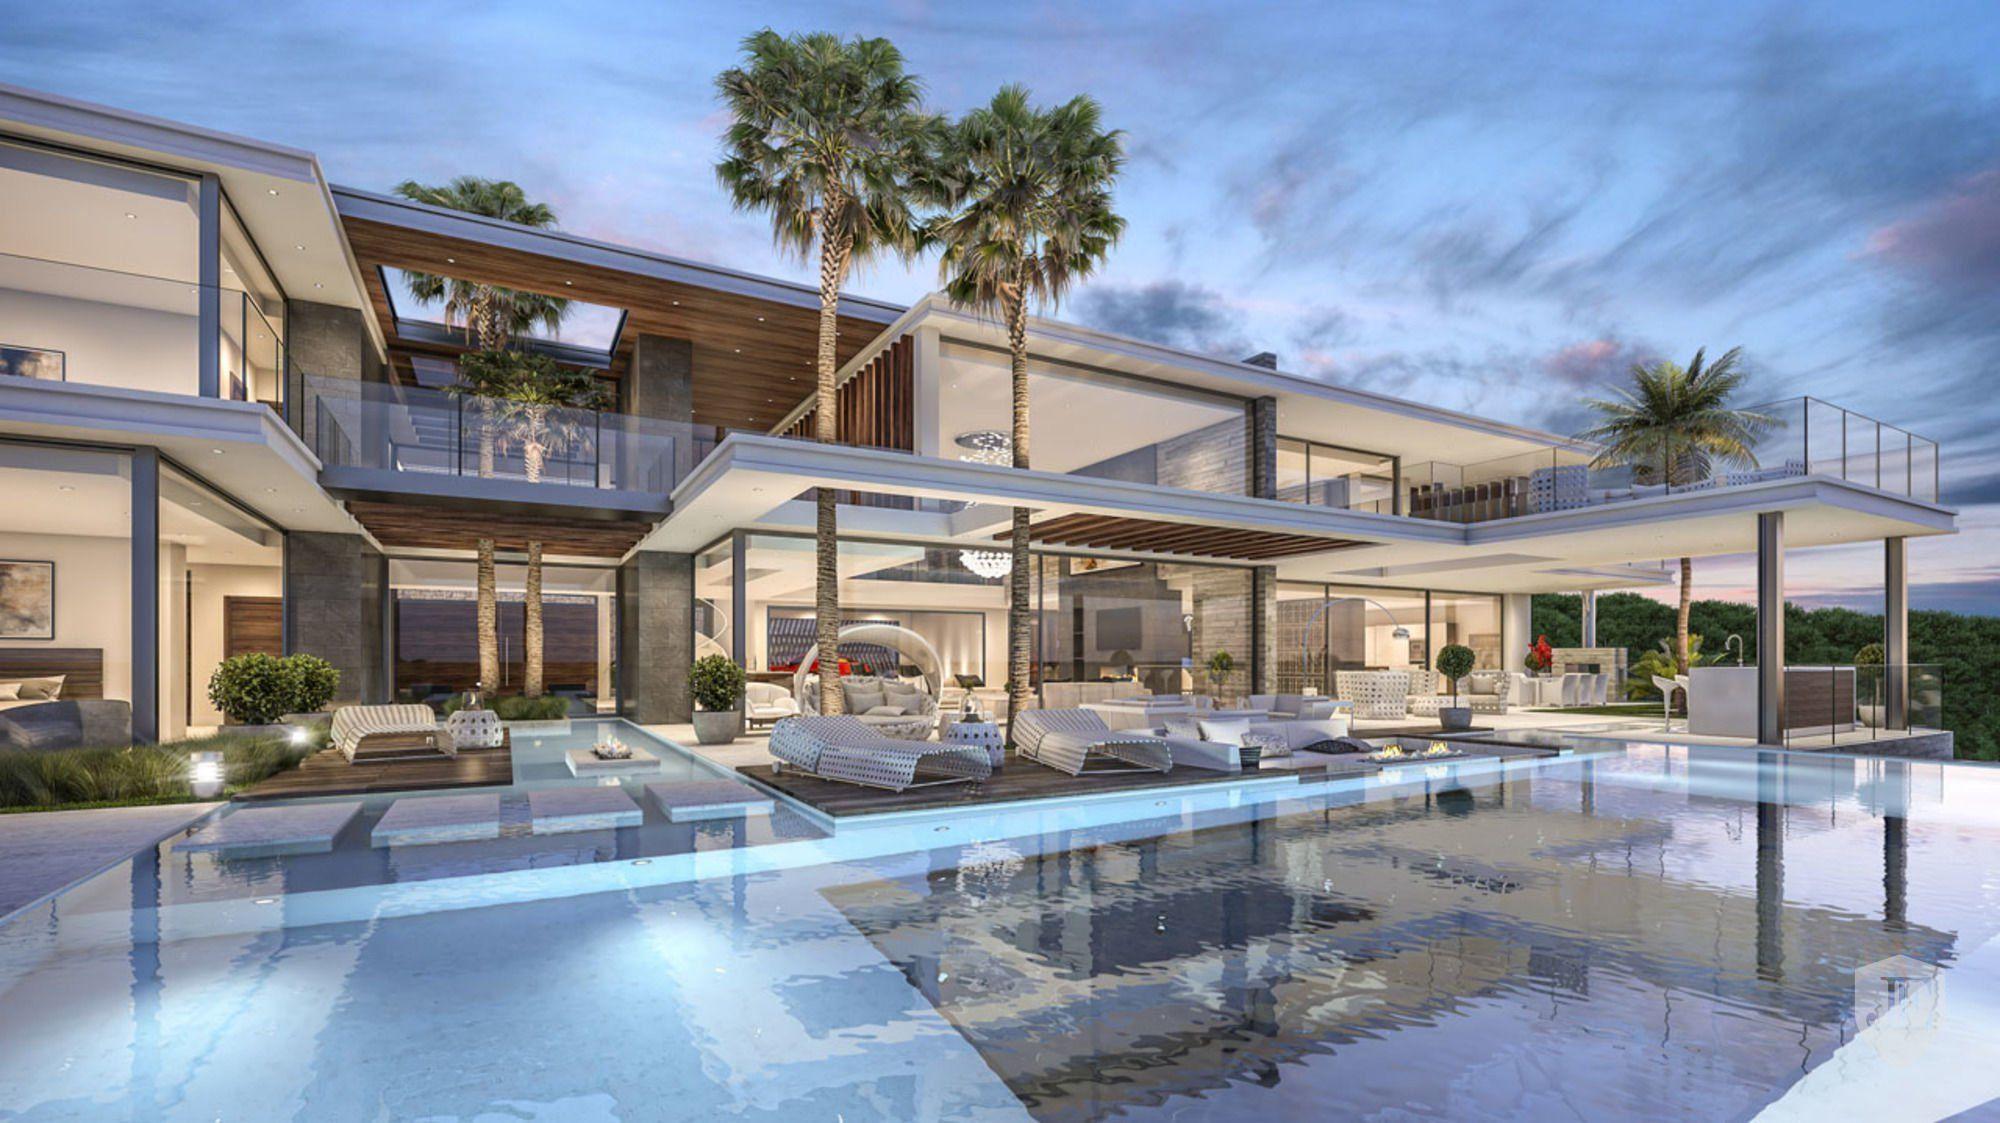 Amazing Luxury Villa Project La Zagaleta Spain In Benahavis Spain For Sale On Jamesedition Luxury Beach House Mansions Luxury Villa